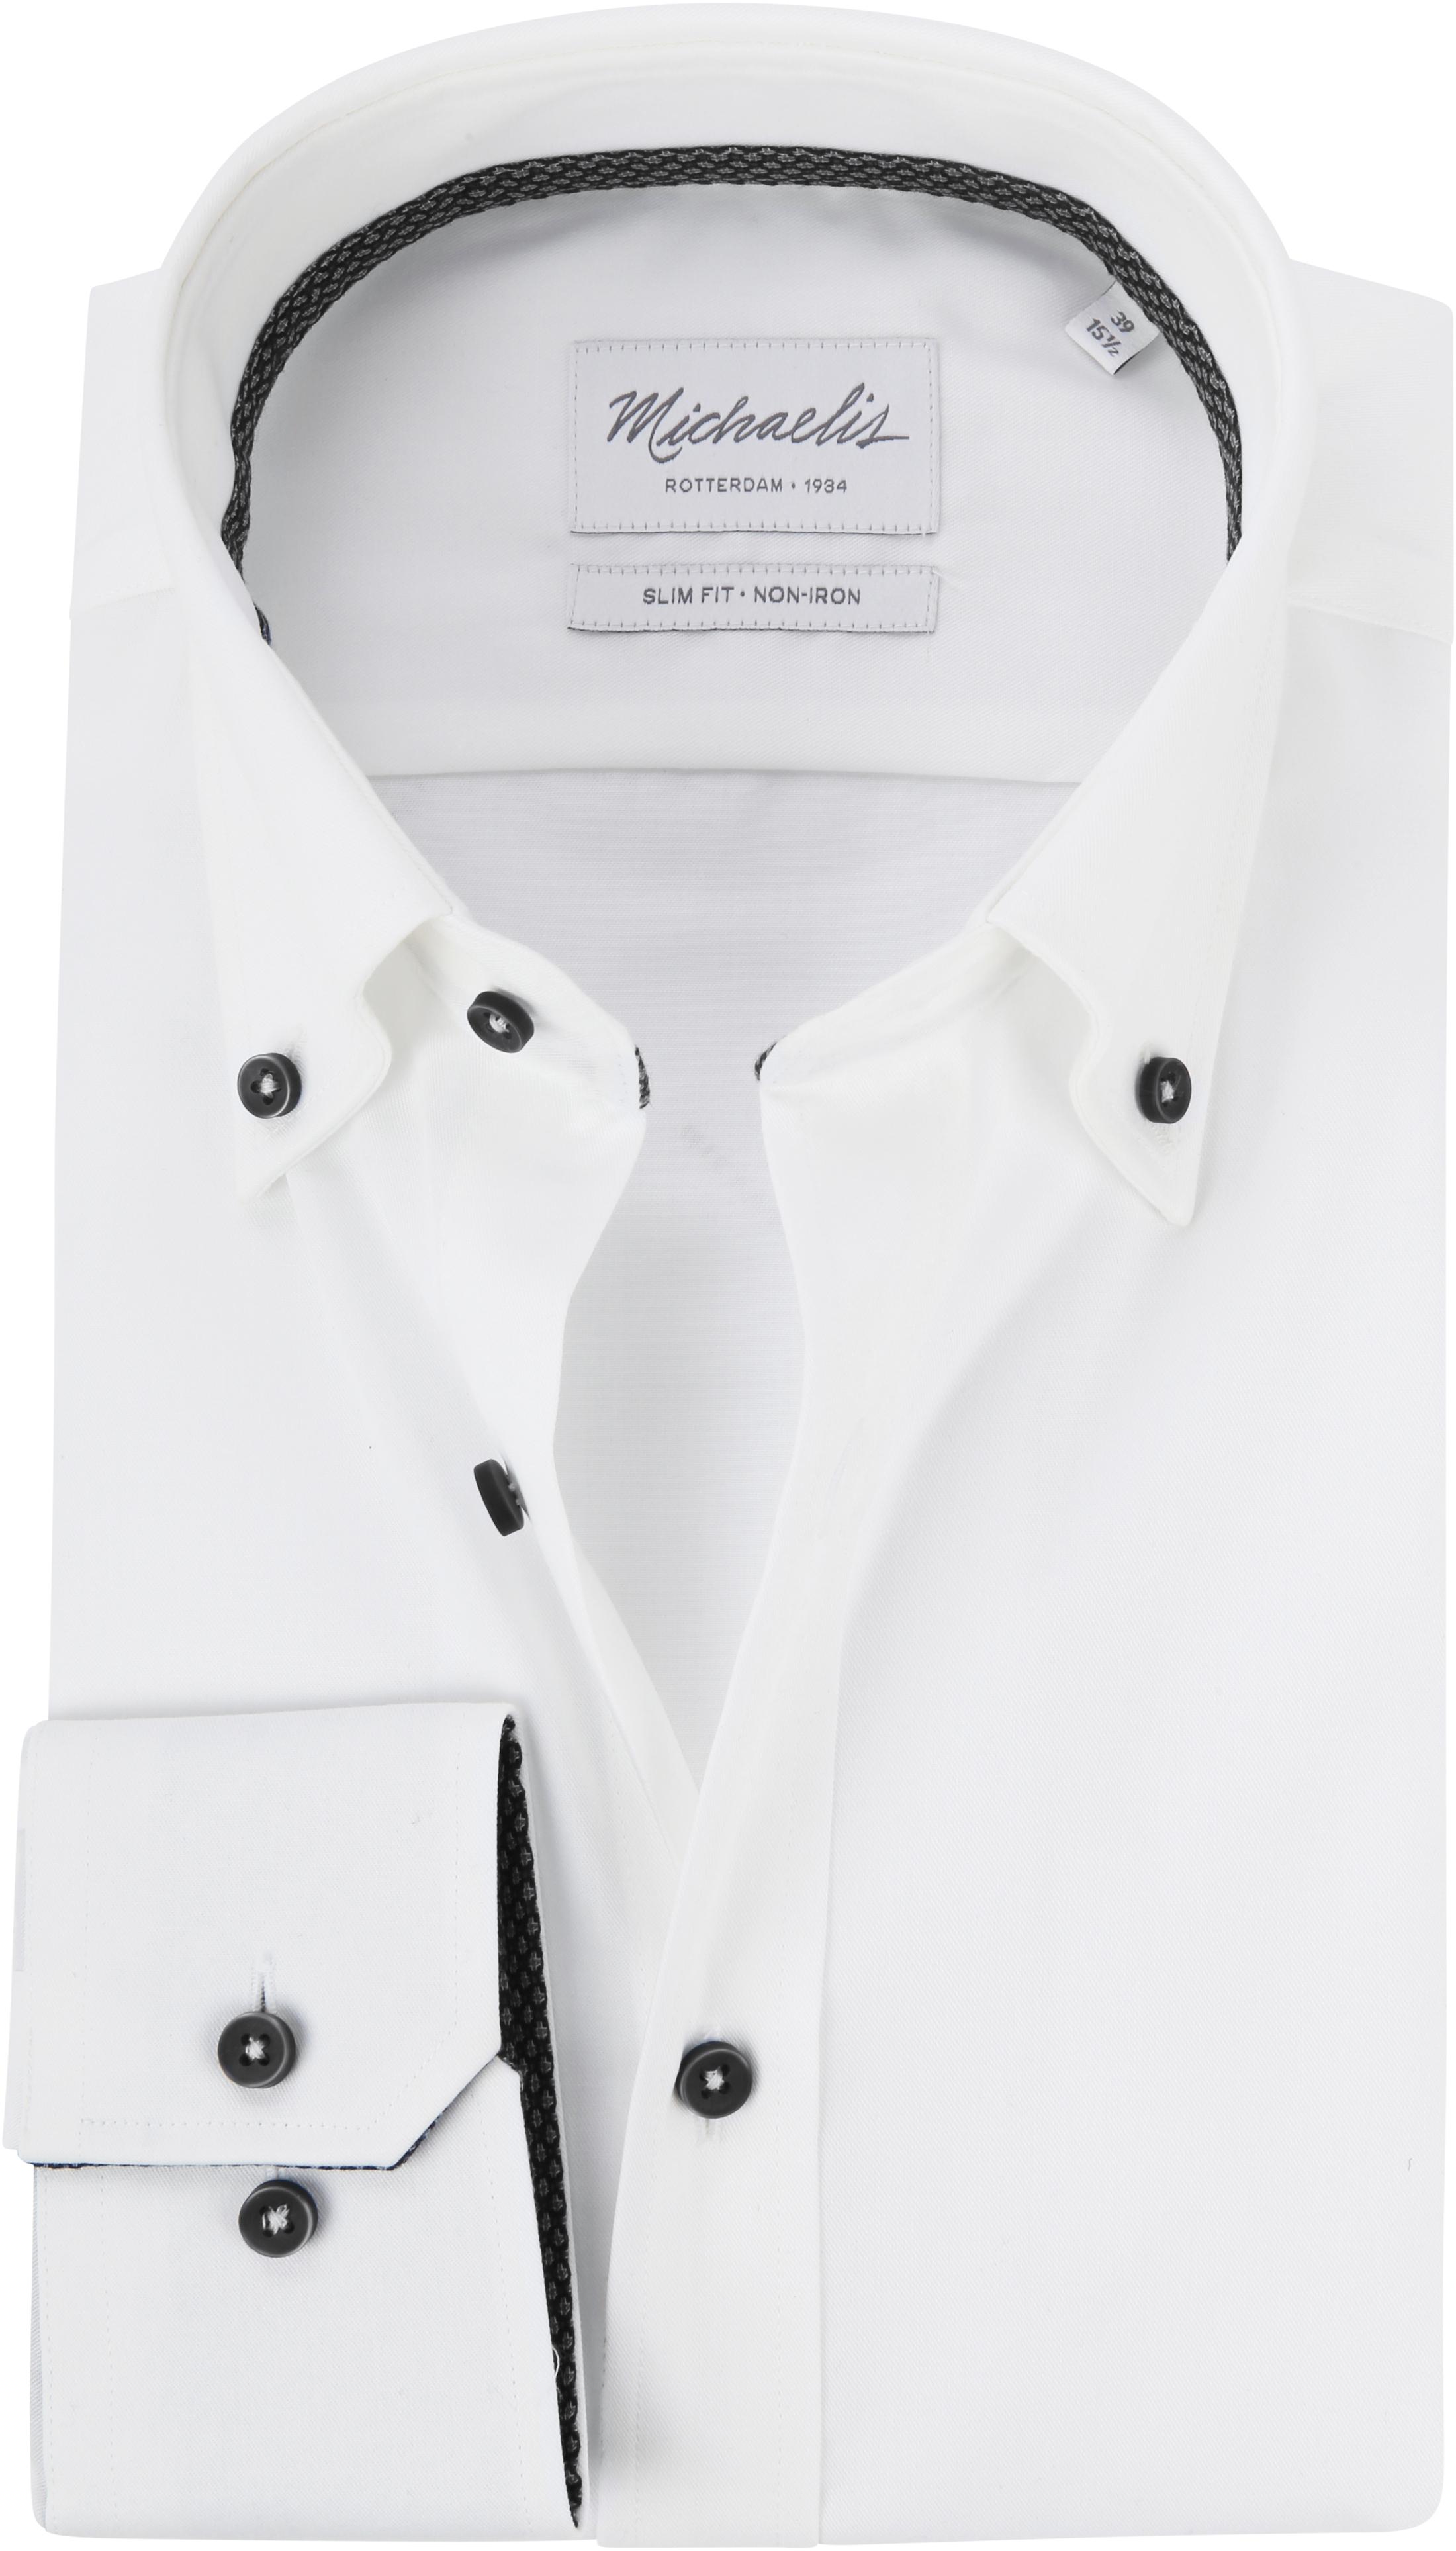 Michaelis Overhemd Button Down Wit foto 0